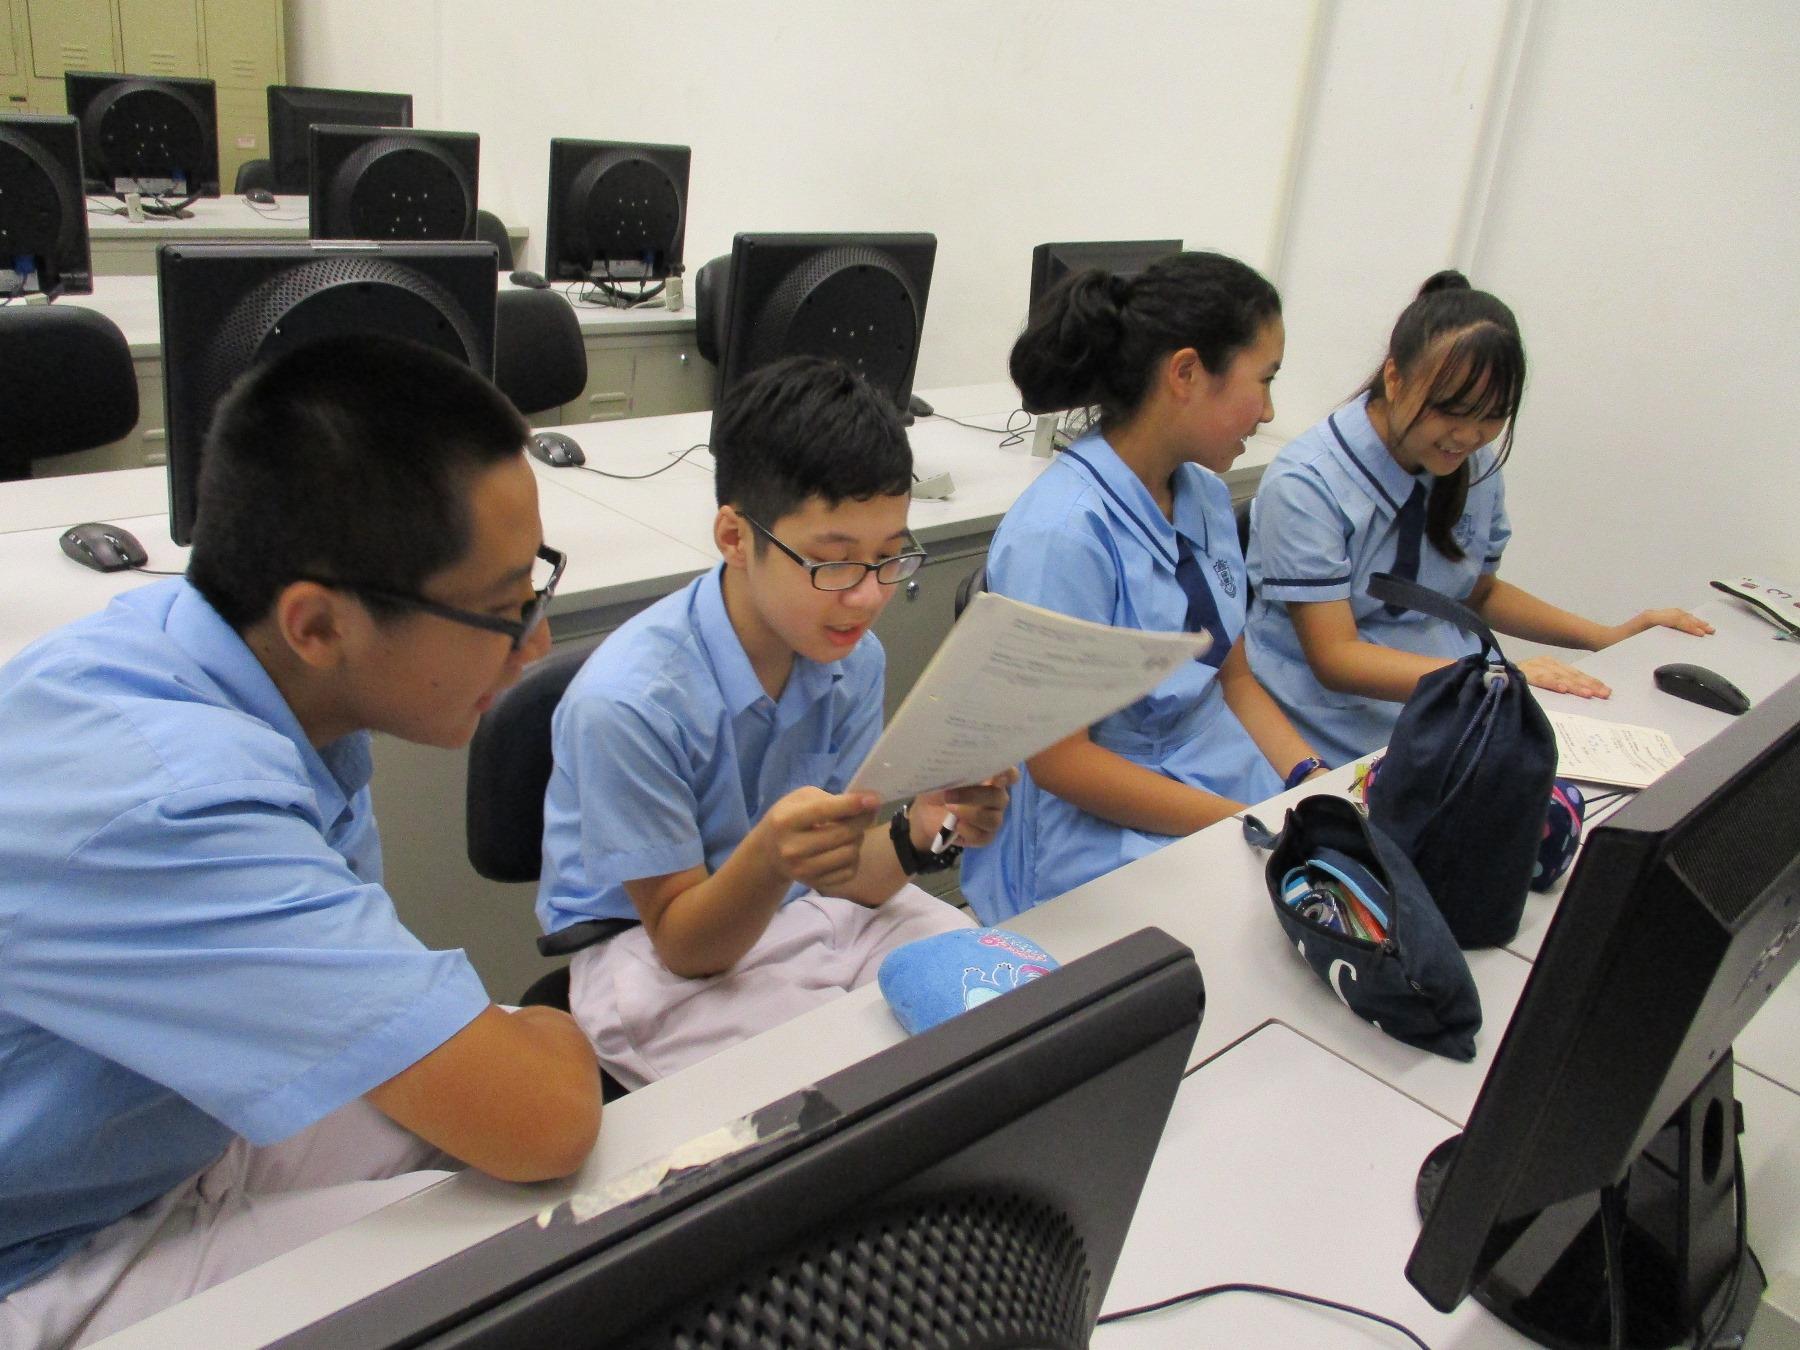 http://www.npc.edu.hk/sites/default/files/img_0147.jpg